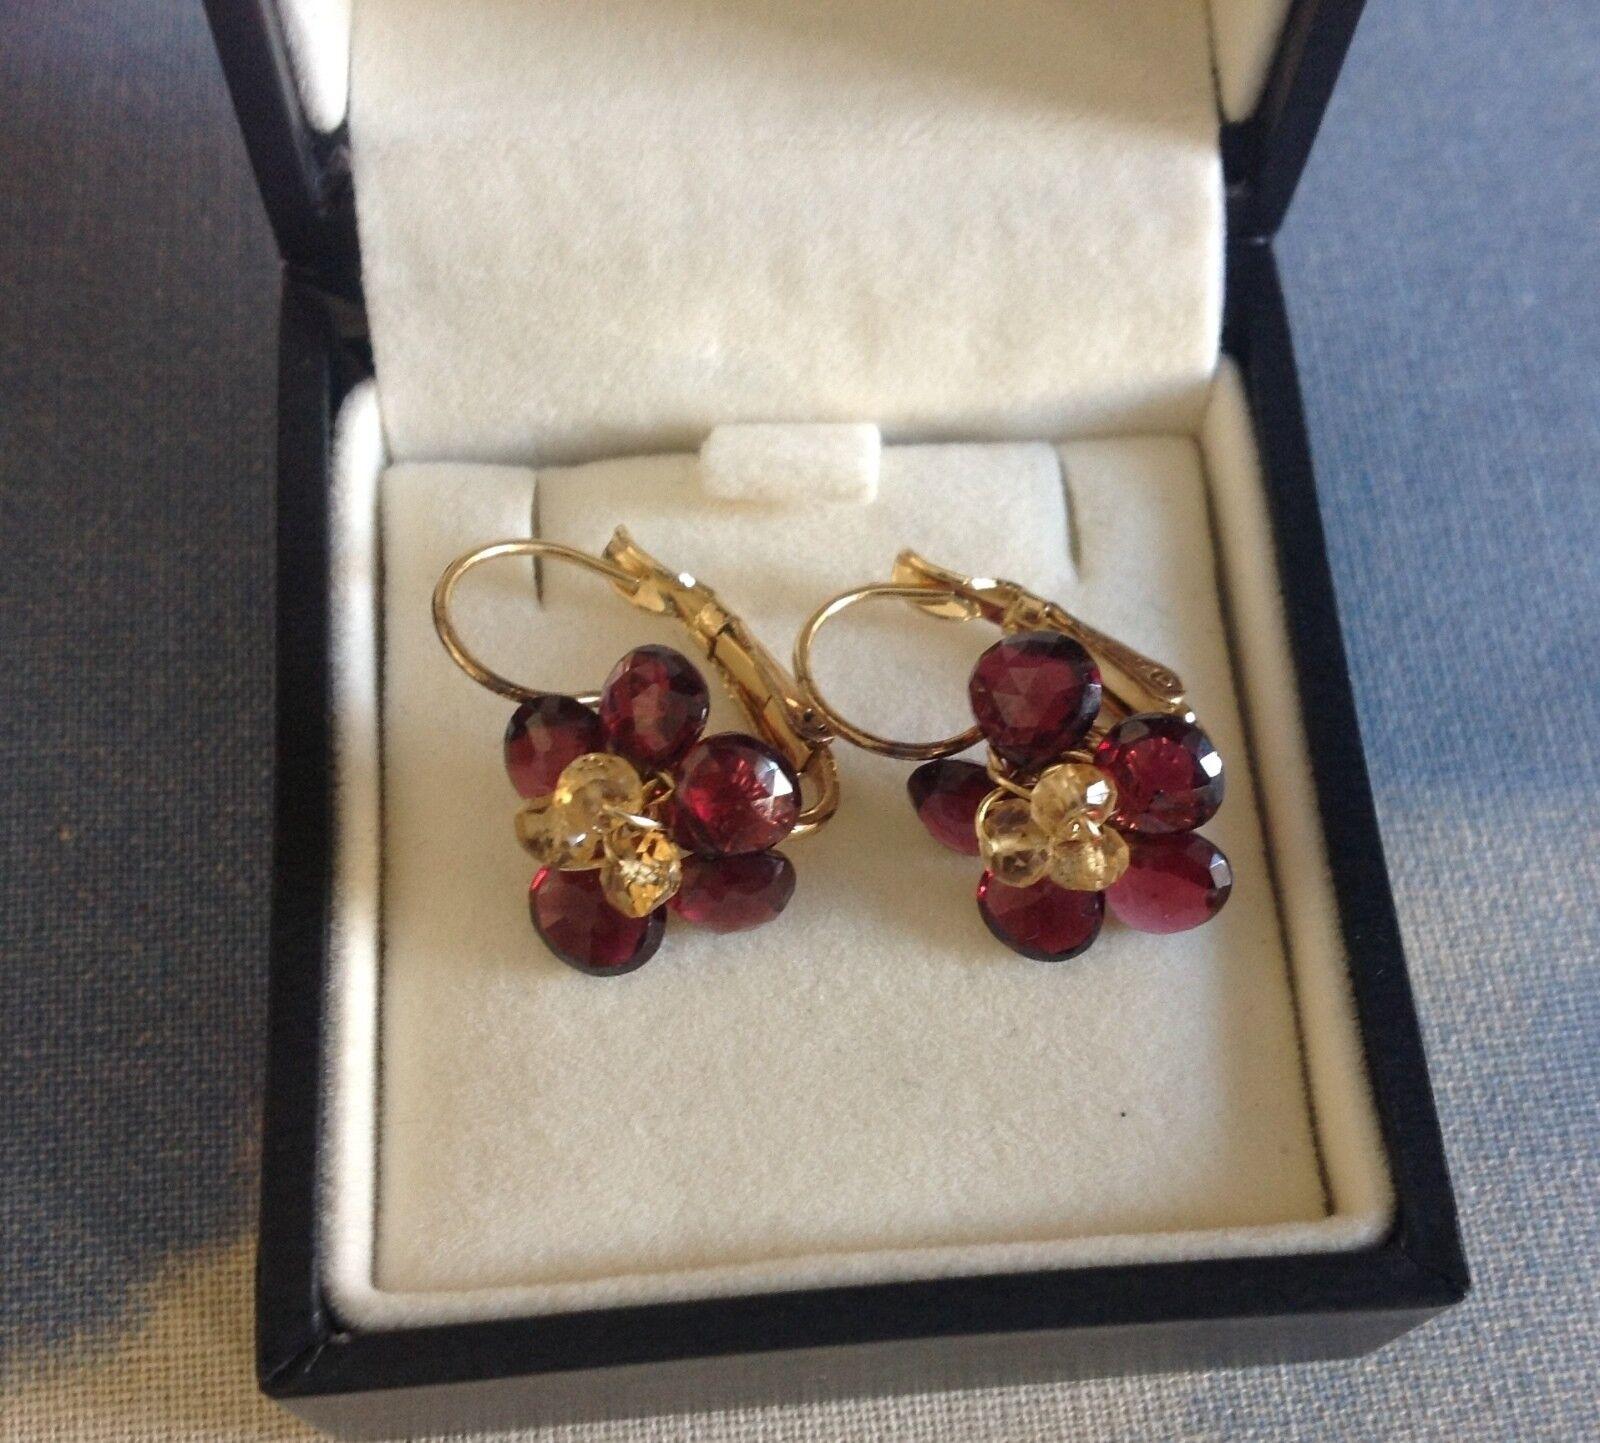 14K gold earrings with granat gemstones